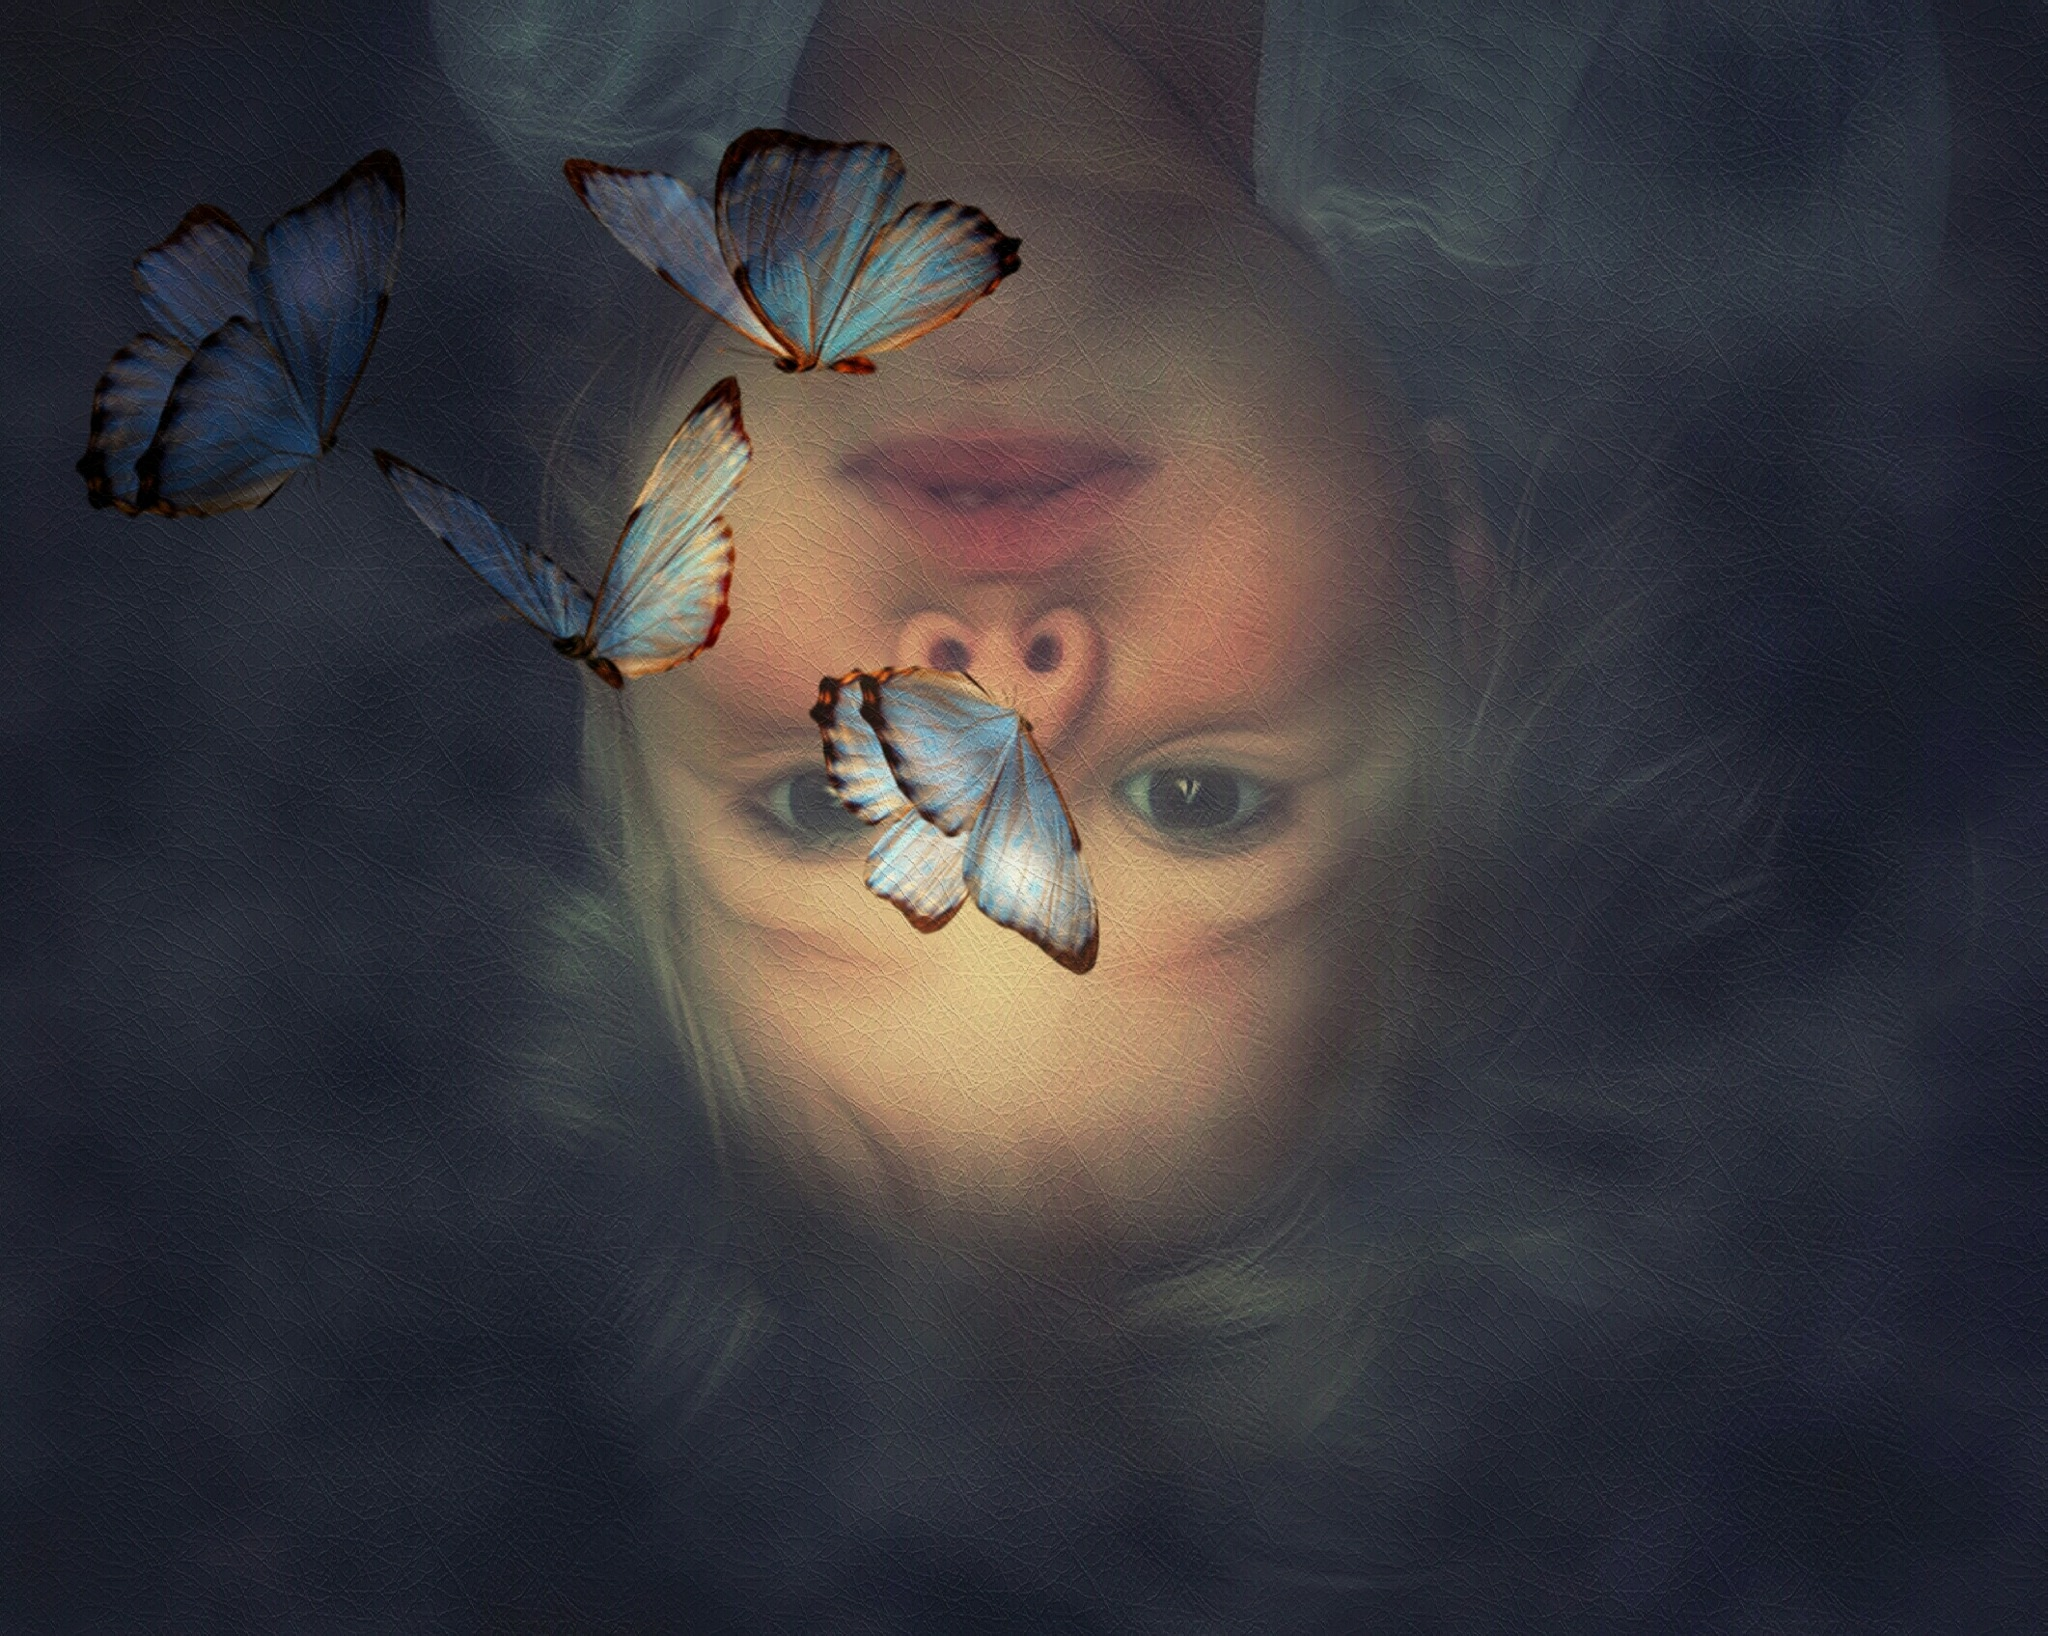 Upside Down! by Minimeme Photo Art